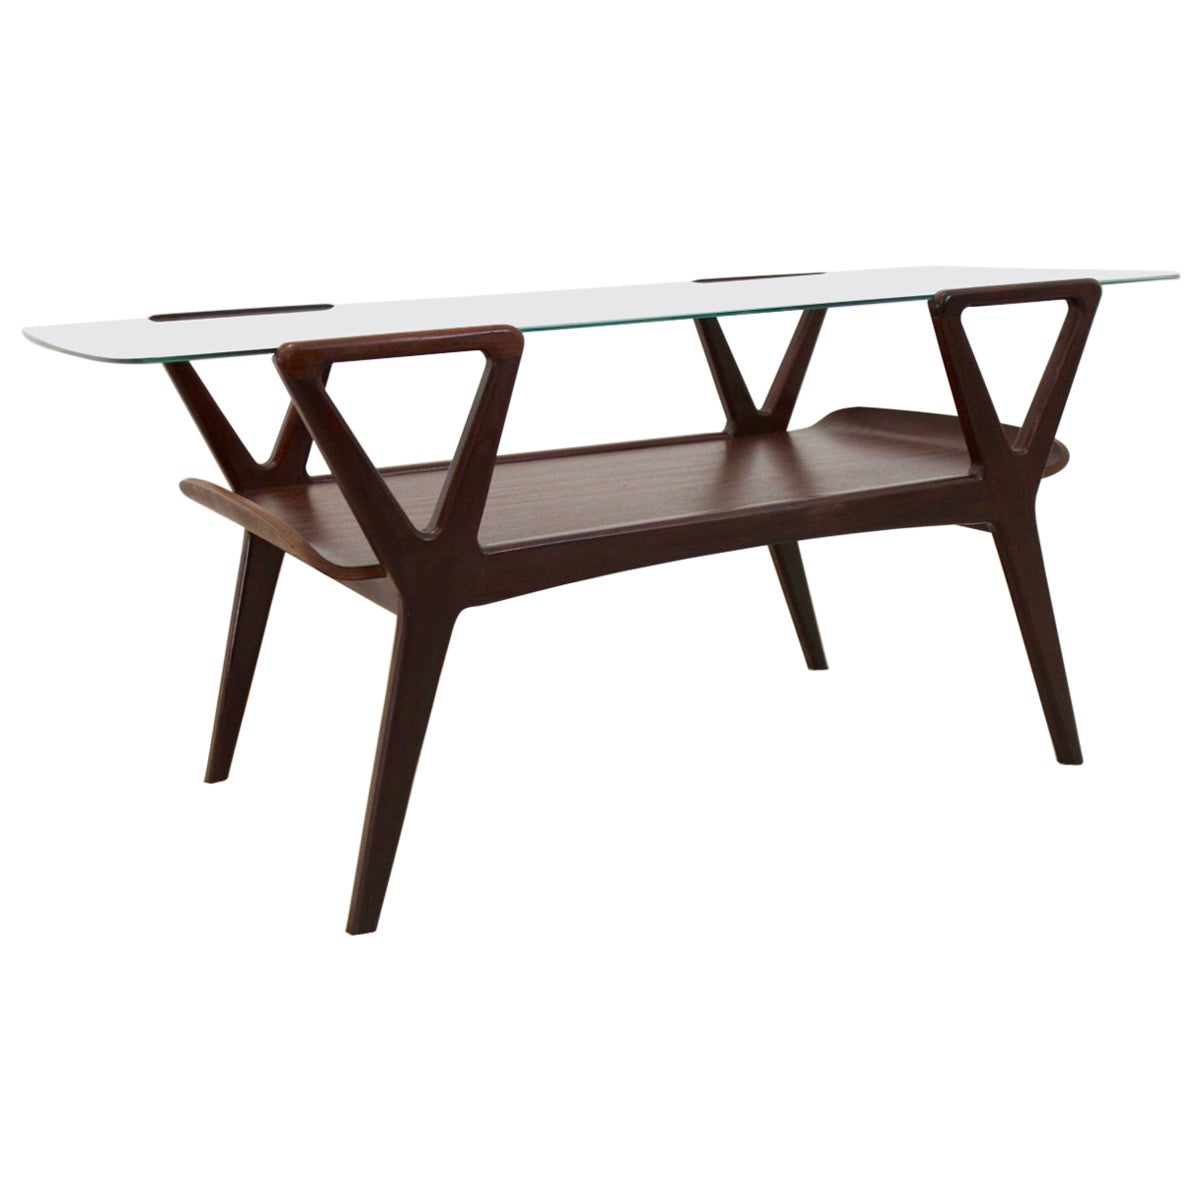 Graphic Scandinavian Teak Coffee Table with Glass Top, 1960s